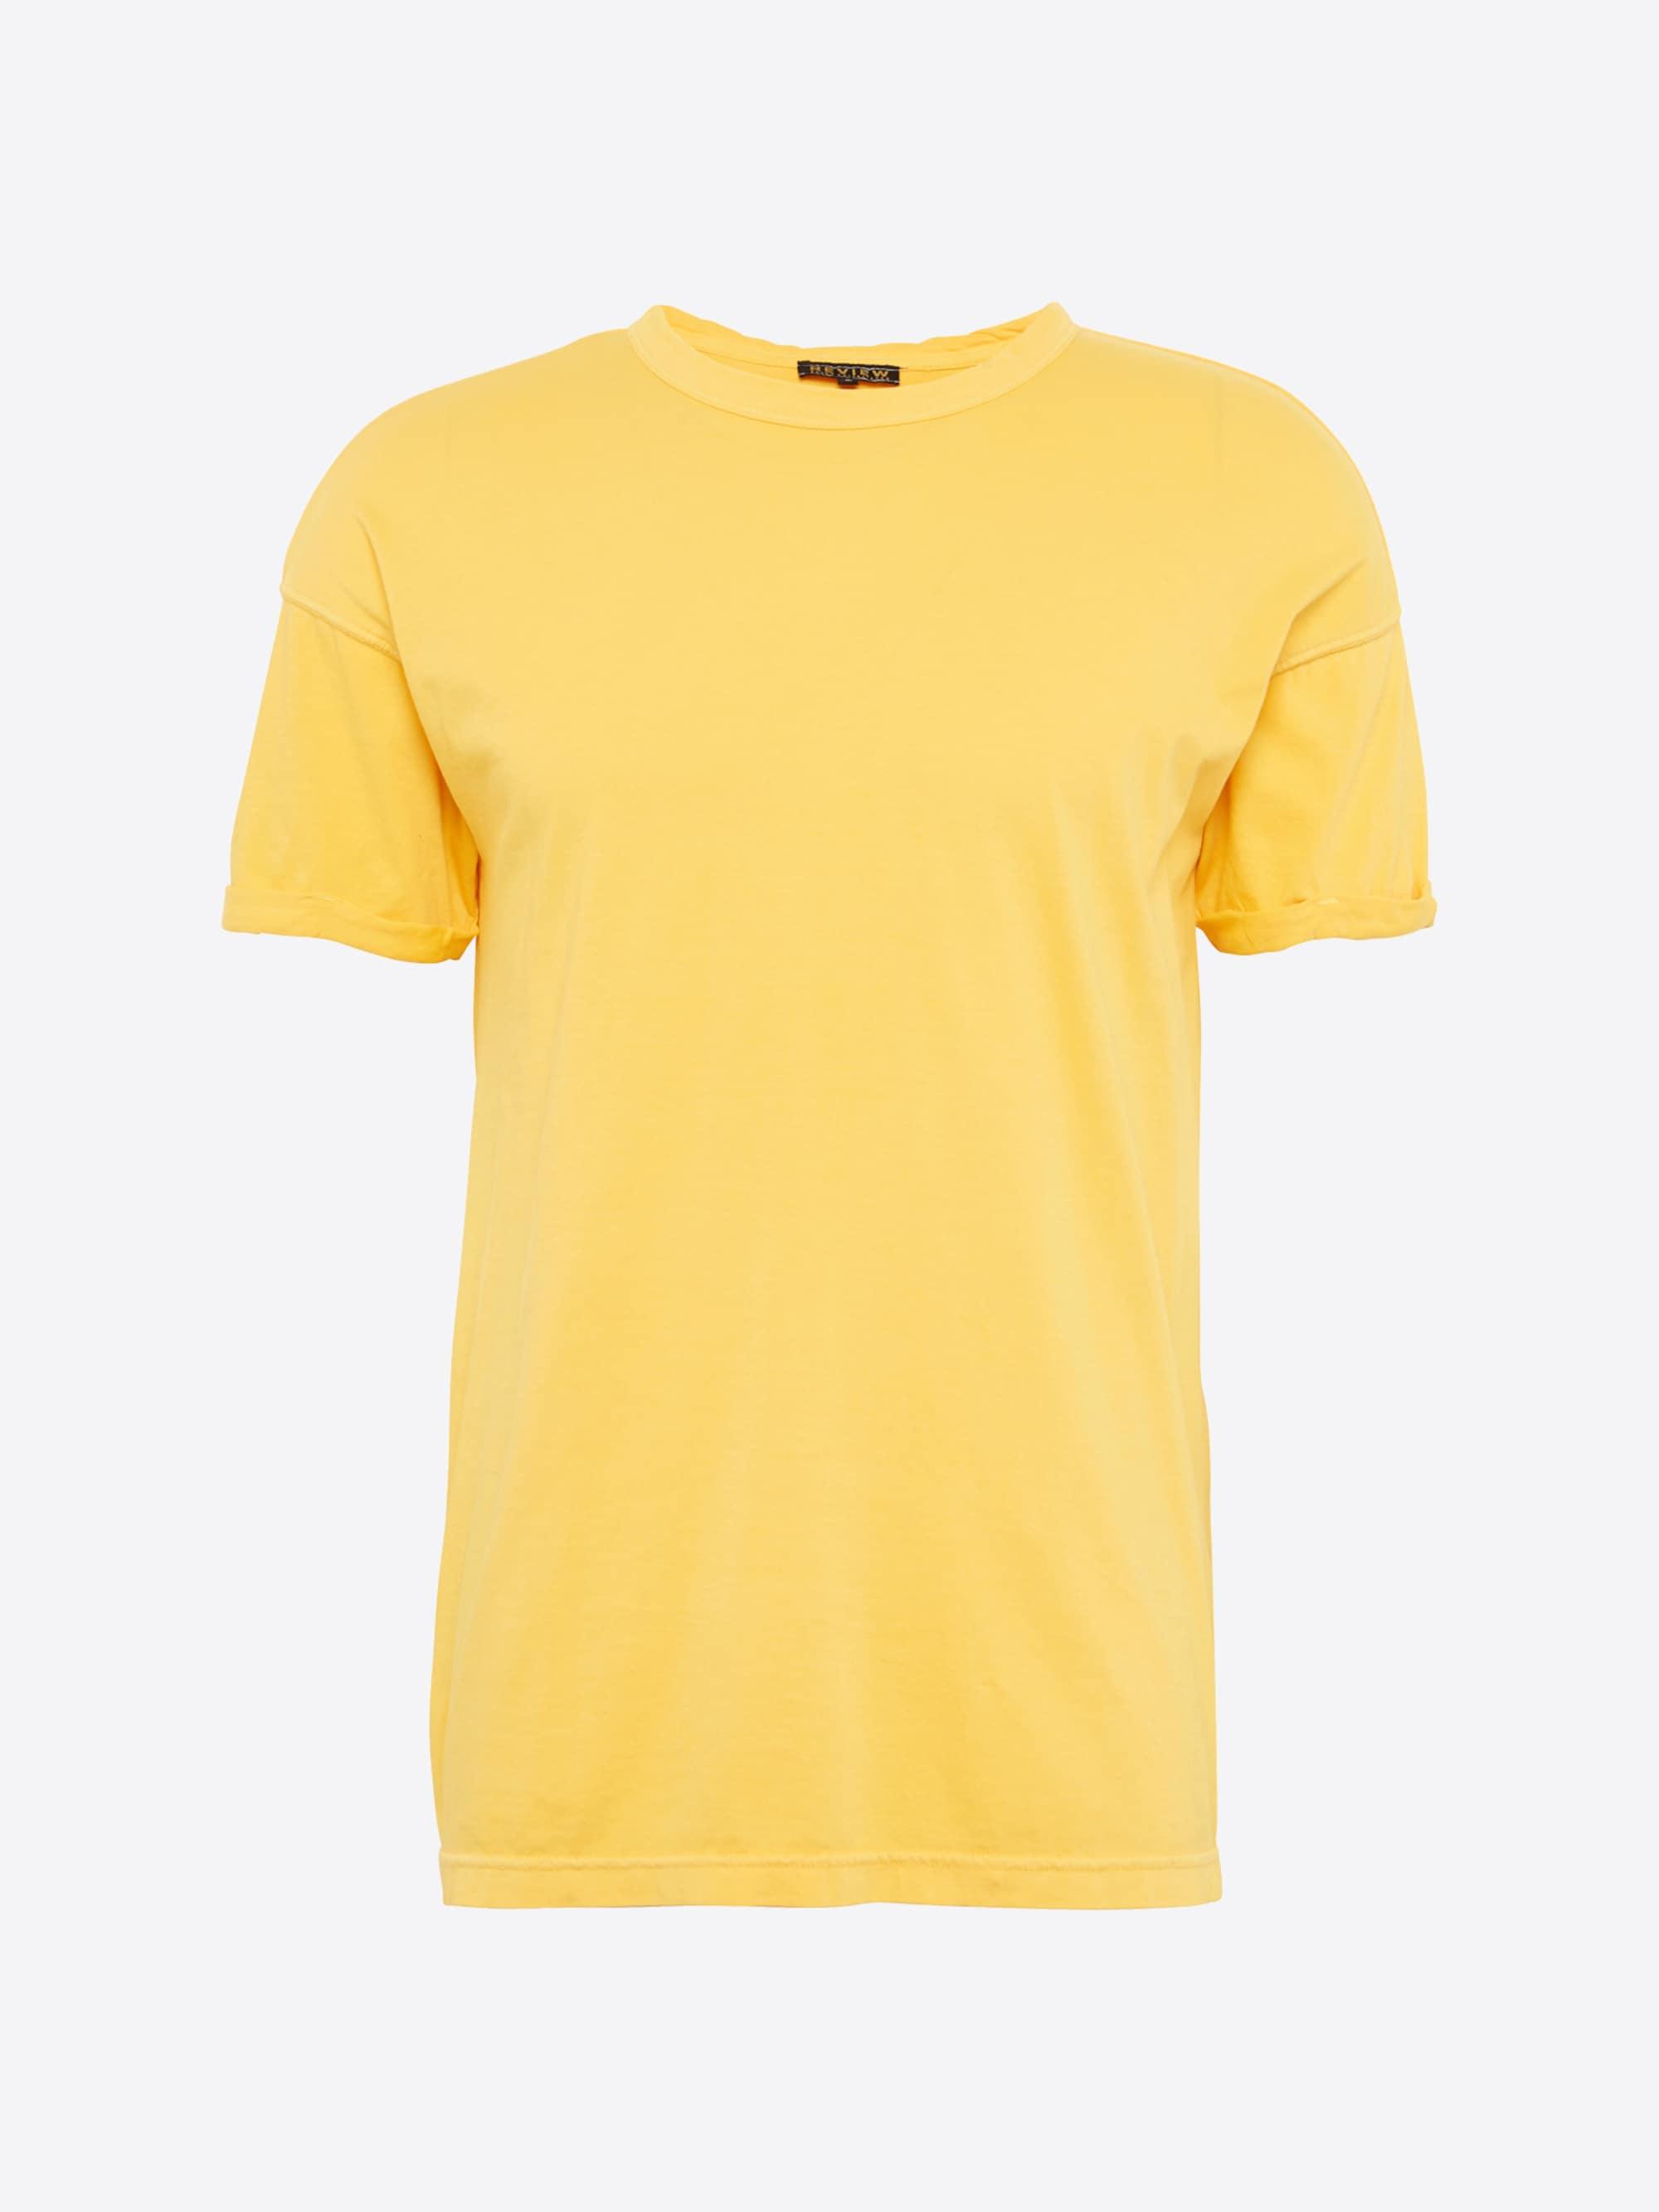 Image of Basic Shirt ´RN OVERCUTTED´